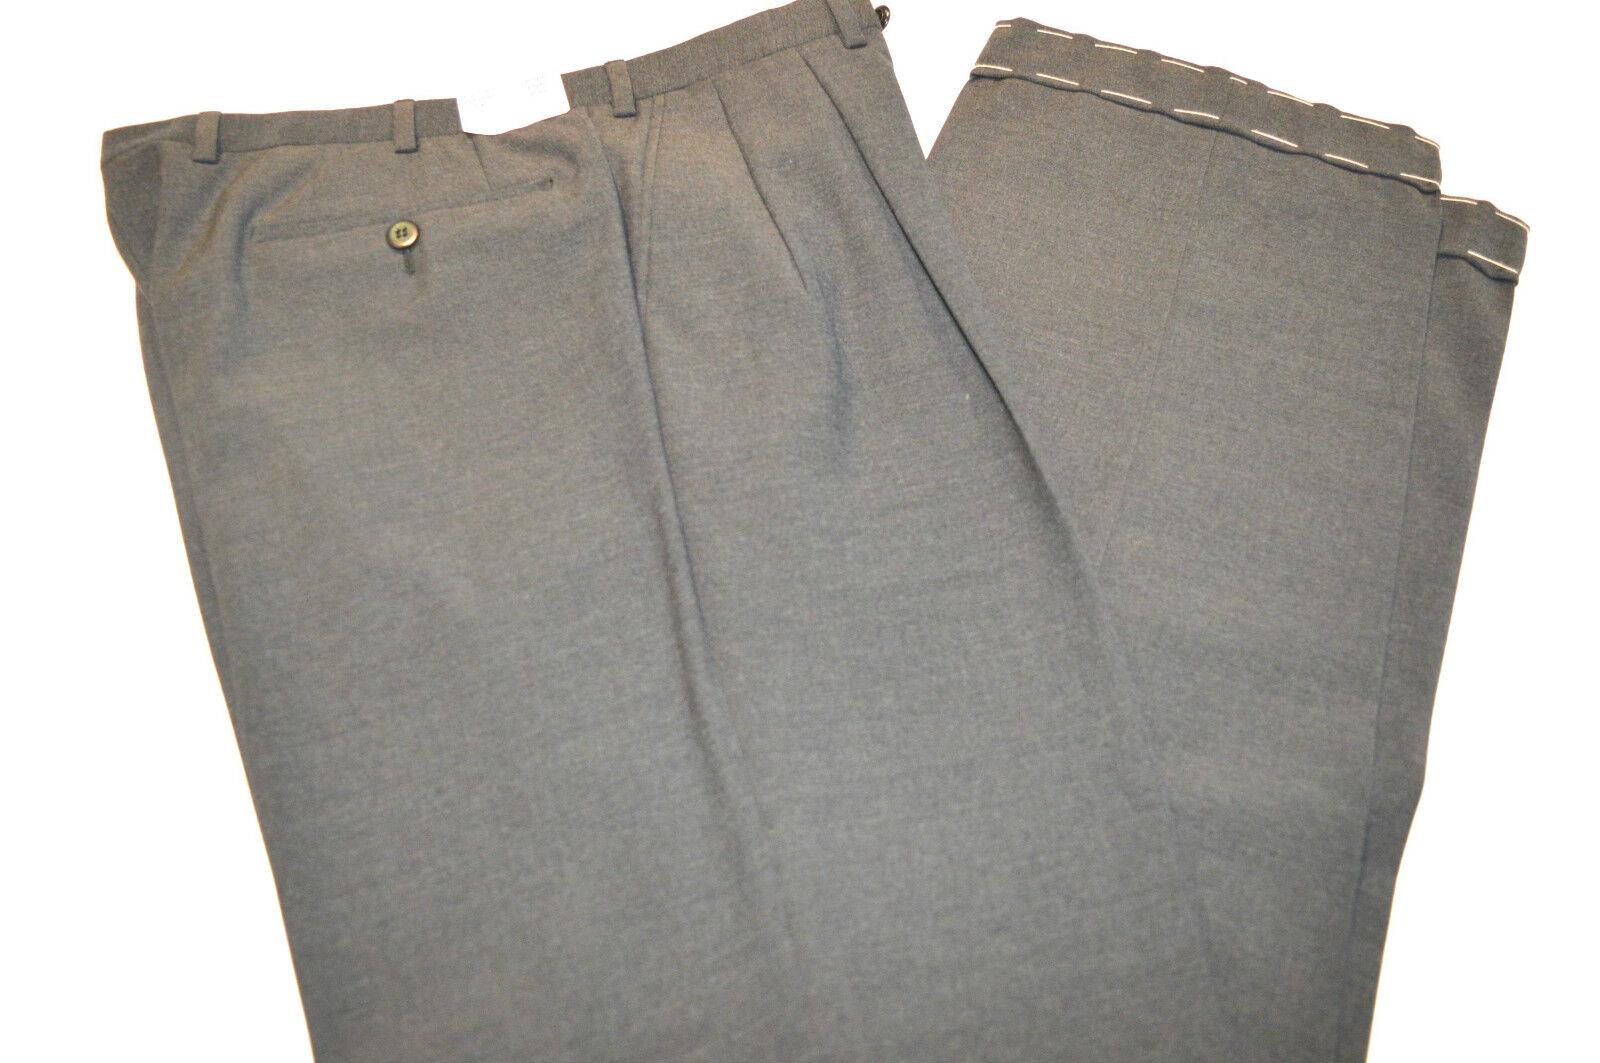 New BRIONI Mod Delta Trouser 100%Wool Dress Pant Size 33 Us 49 Eu (Cod 46)